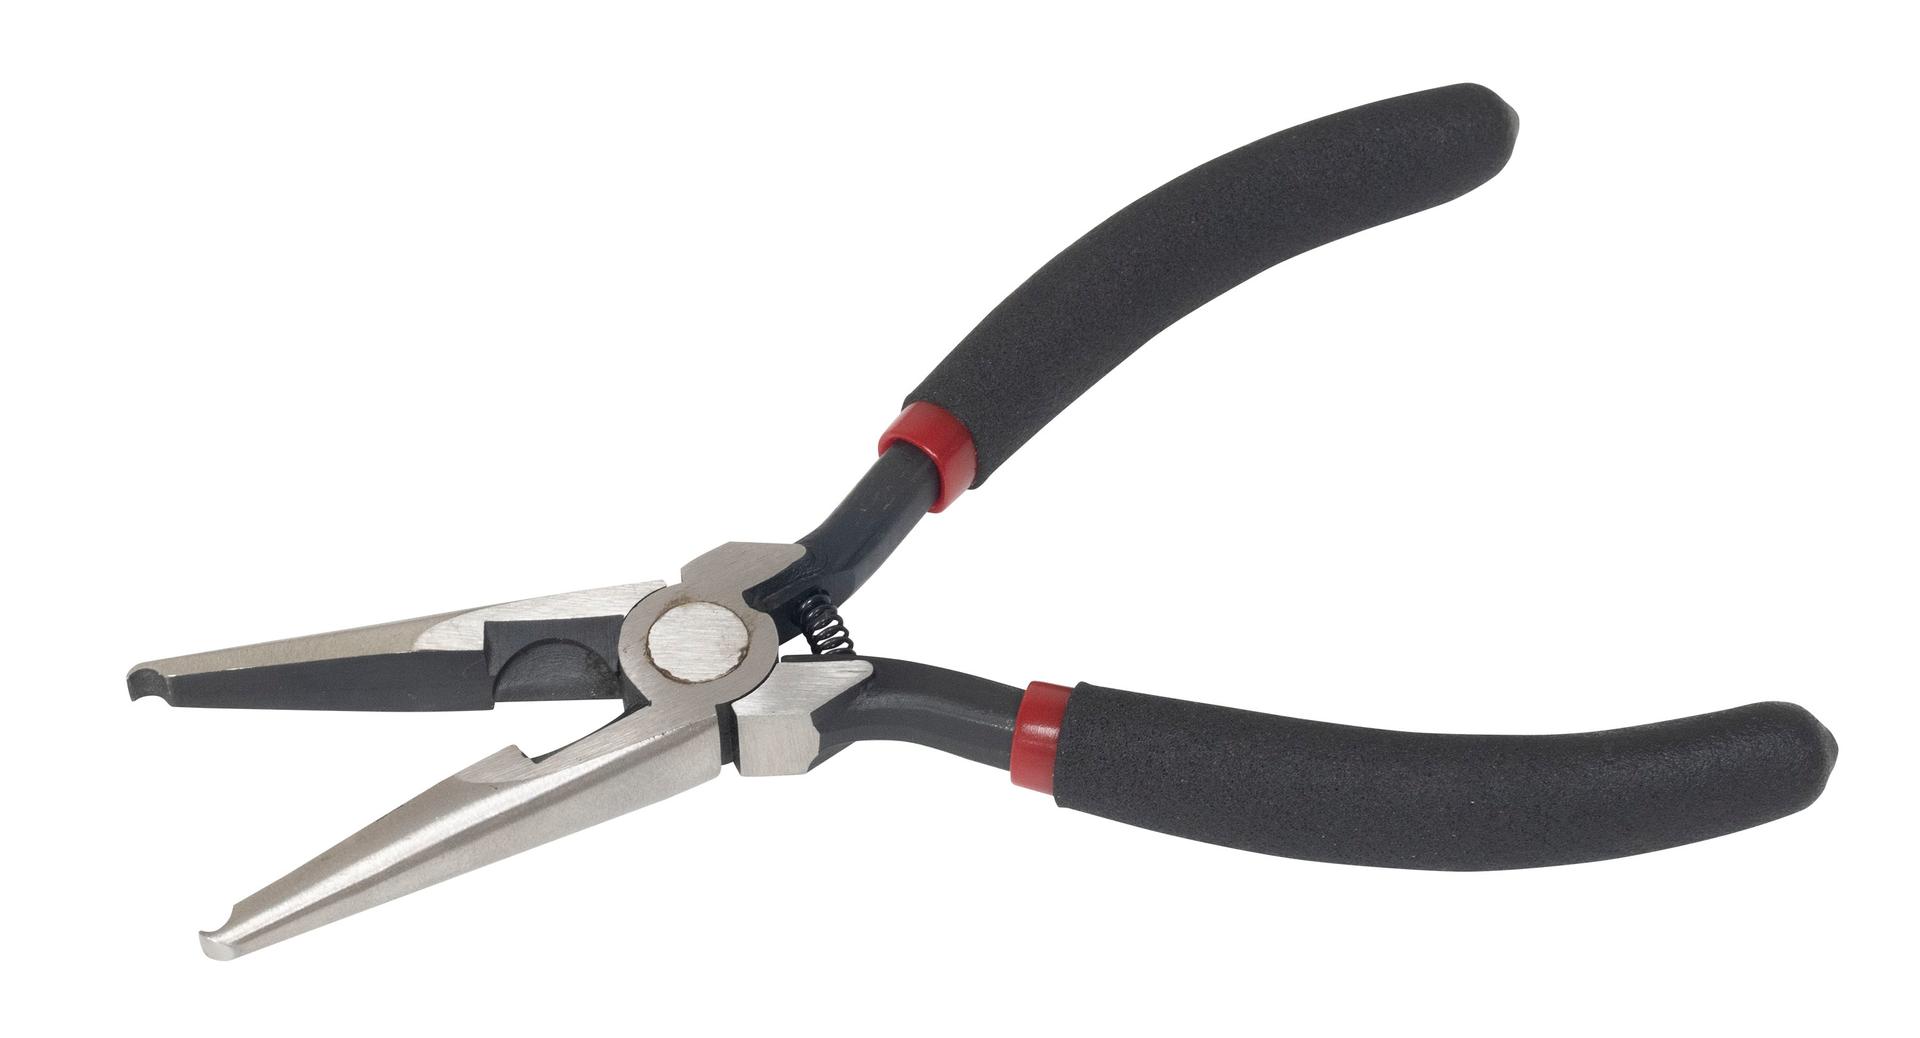 Dent Fix DF-SP360 Shunting Pliers dfsp360